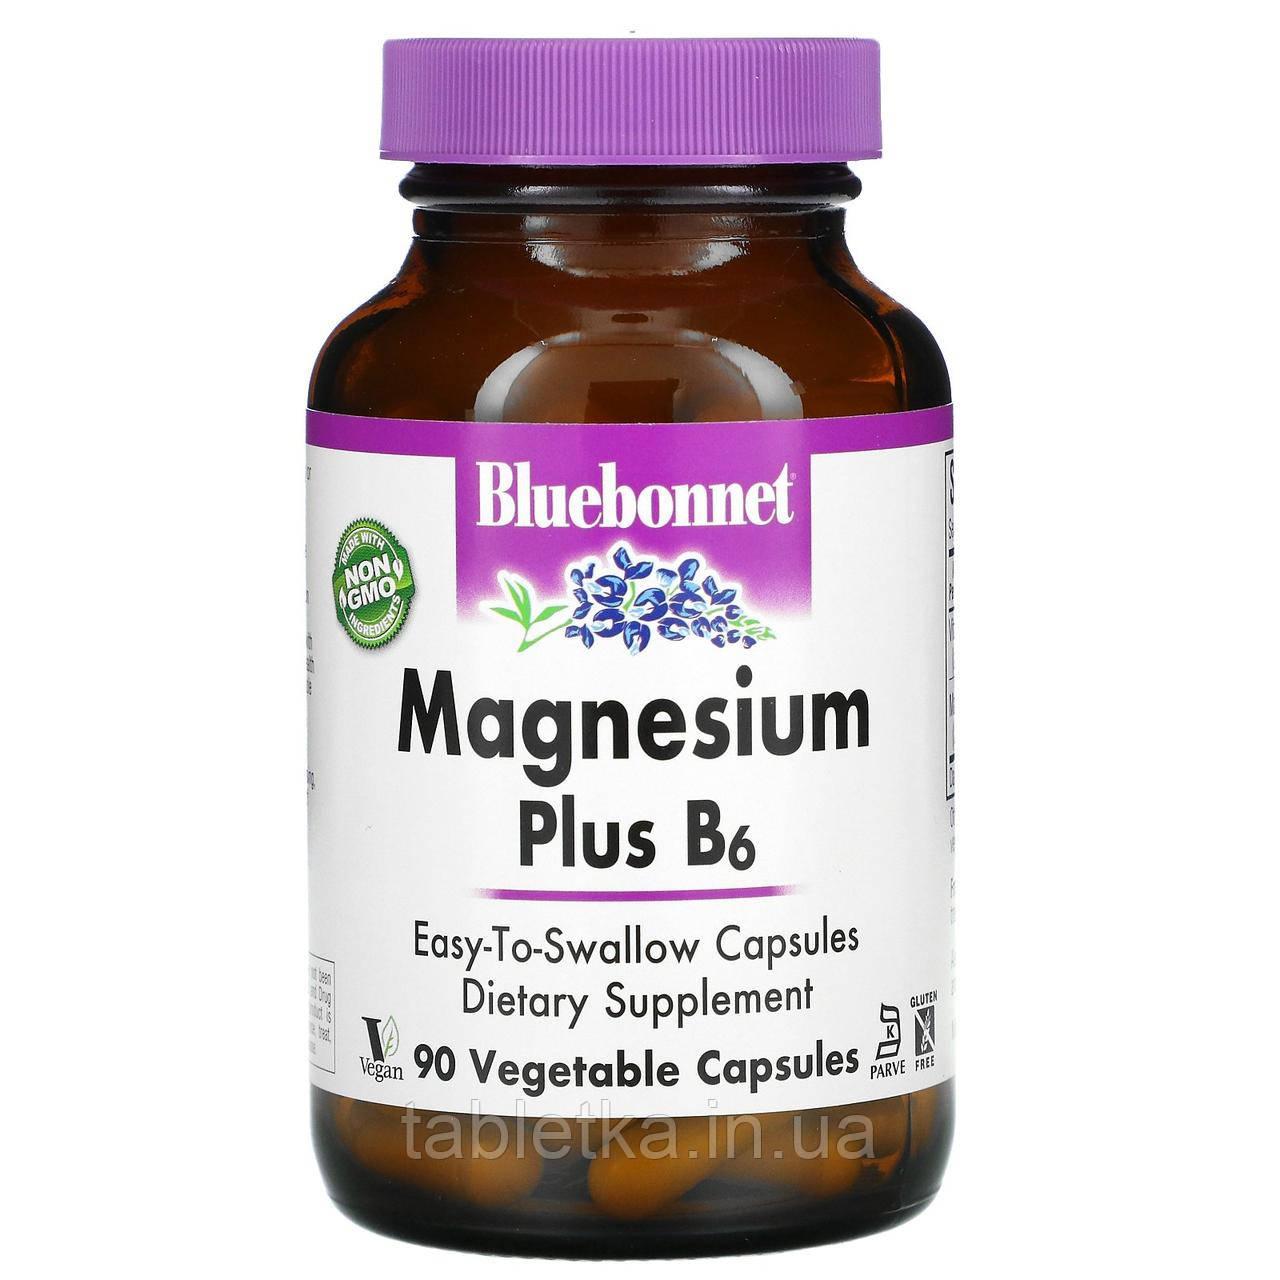 Bluebonnet Nutrition, магний и витамин B6, 90 вегетарианских капсул